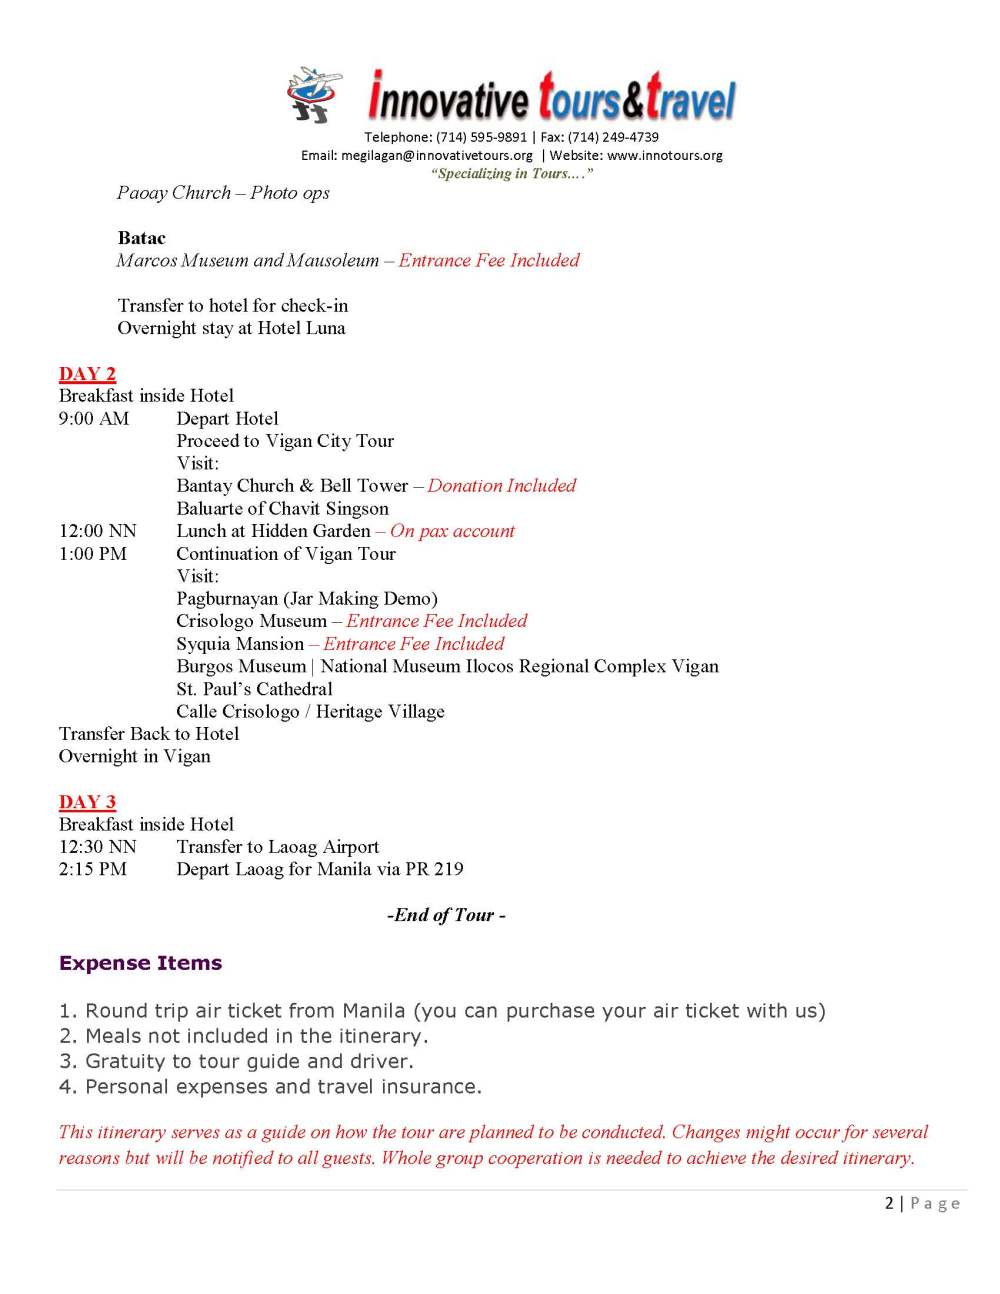 Laoag-Vigan Tour_Page_2